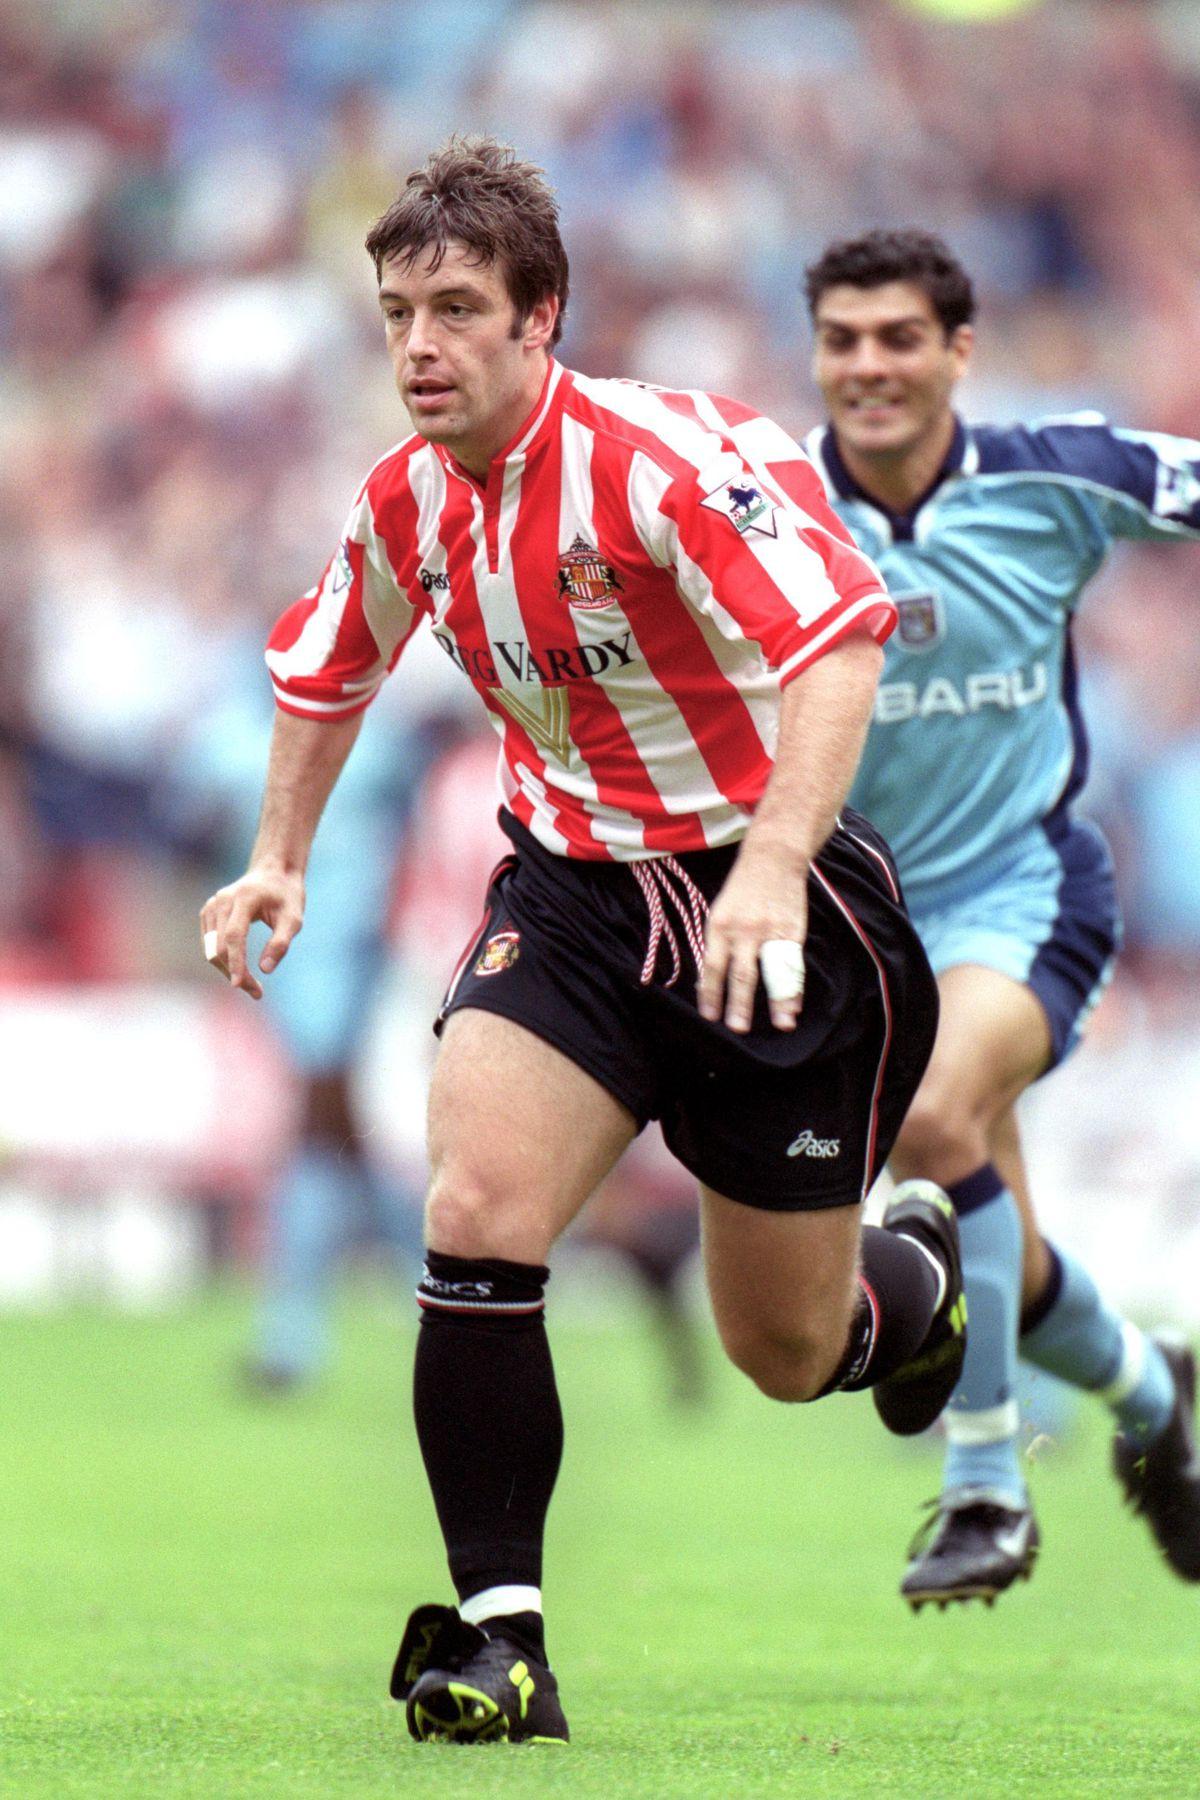 Soccer - FA Carling Premiership - Sunderland v Coventry City